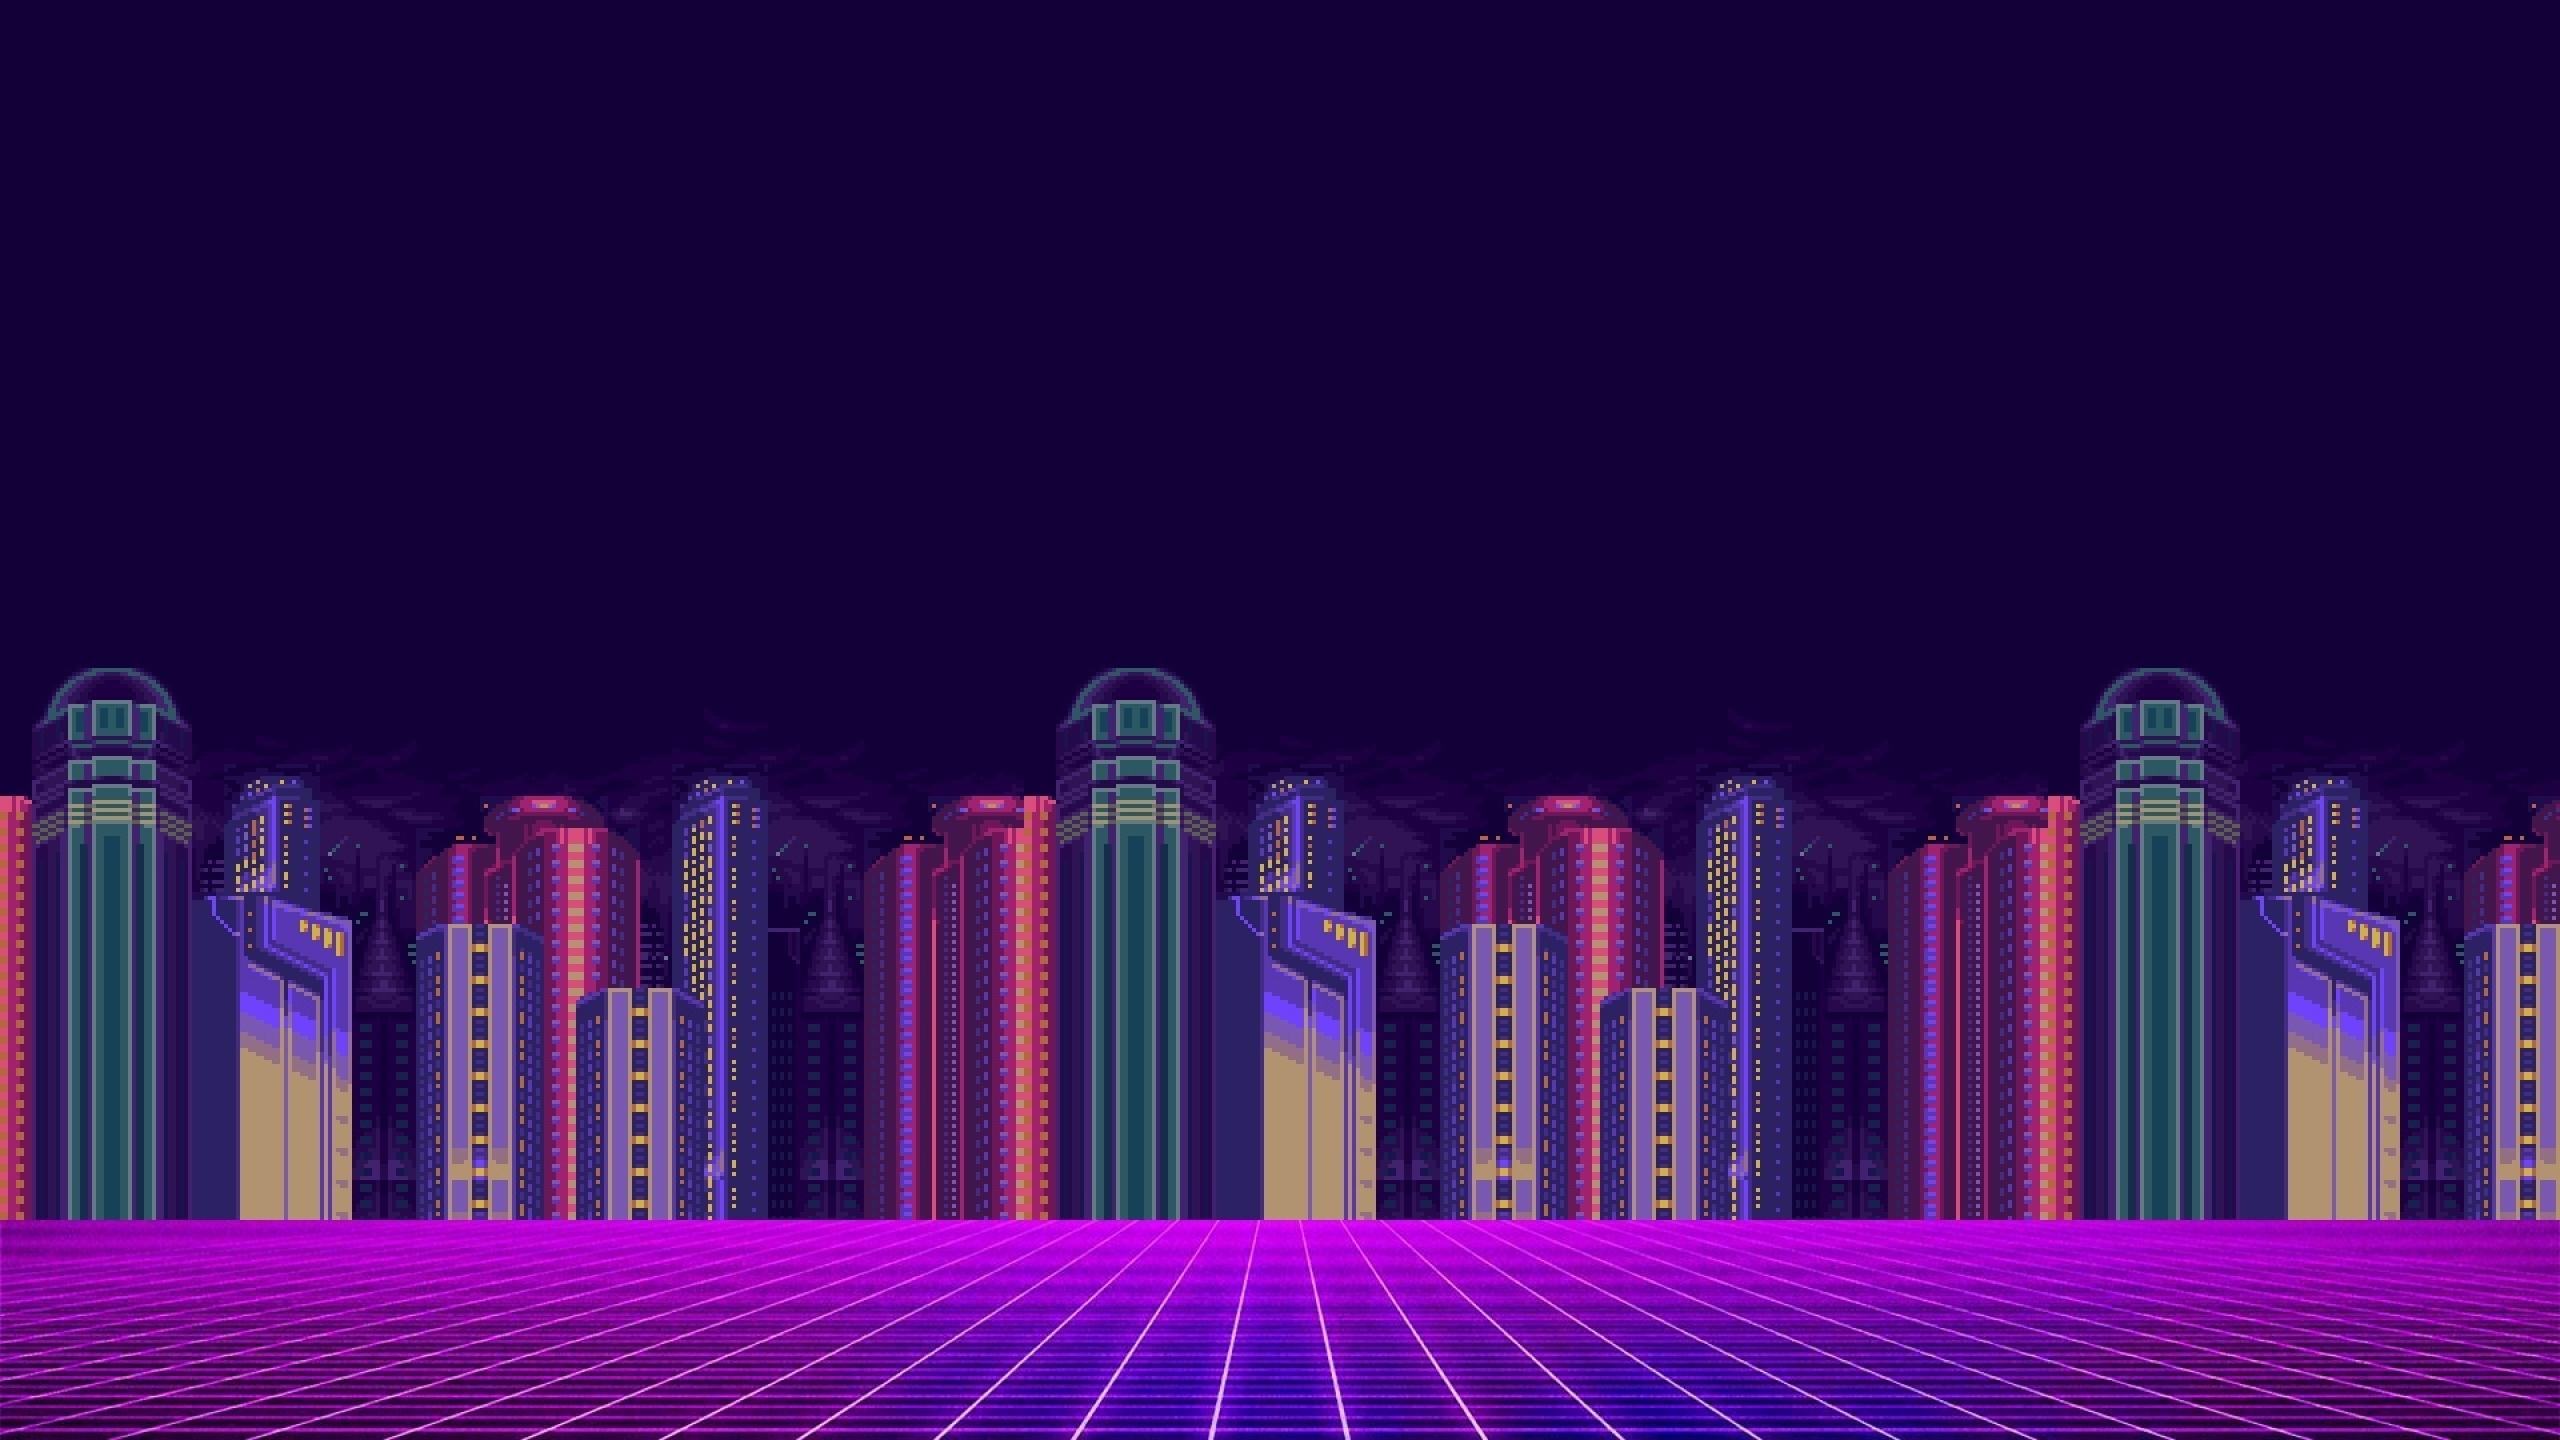 2560x1440 Synthwave 8-bit Pixel Cityscape 1440P Resolution ...